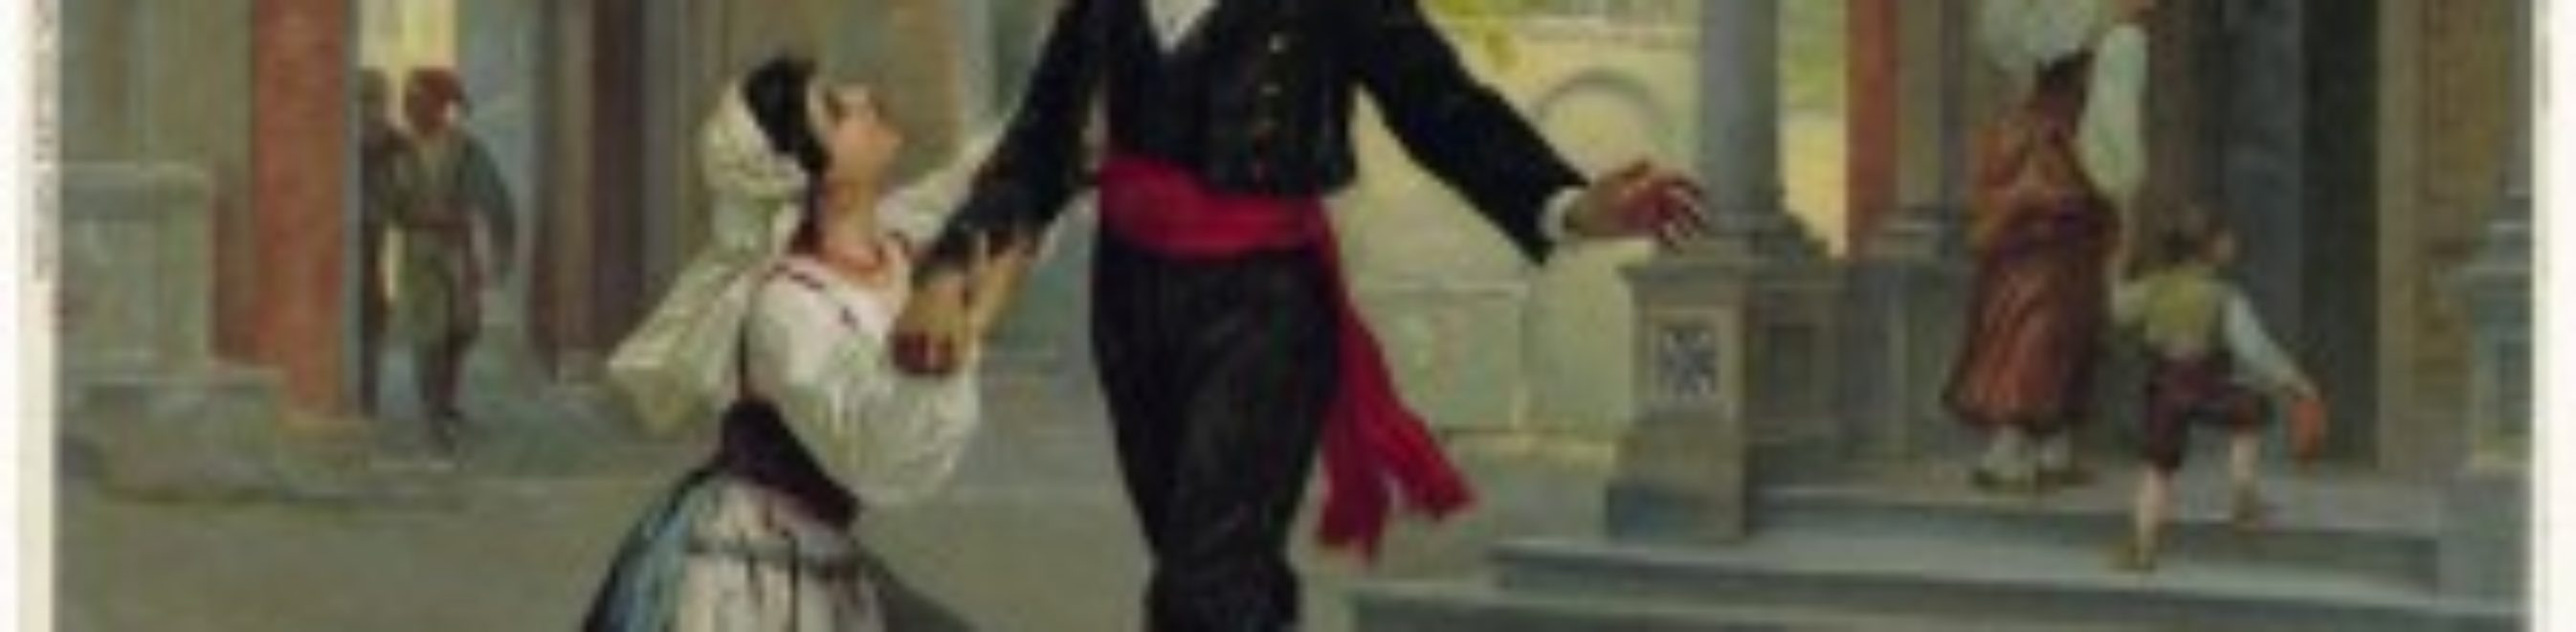 Cavalleria Rusticana: fiaba dark